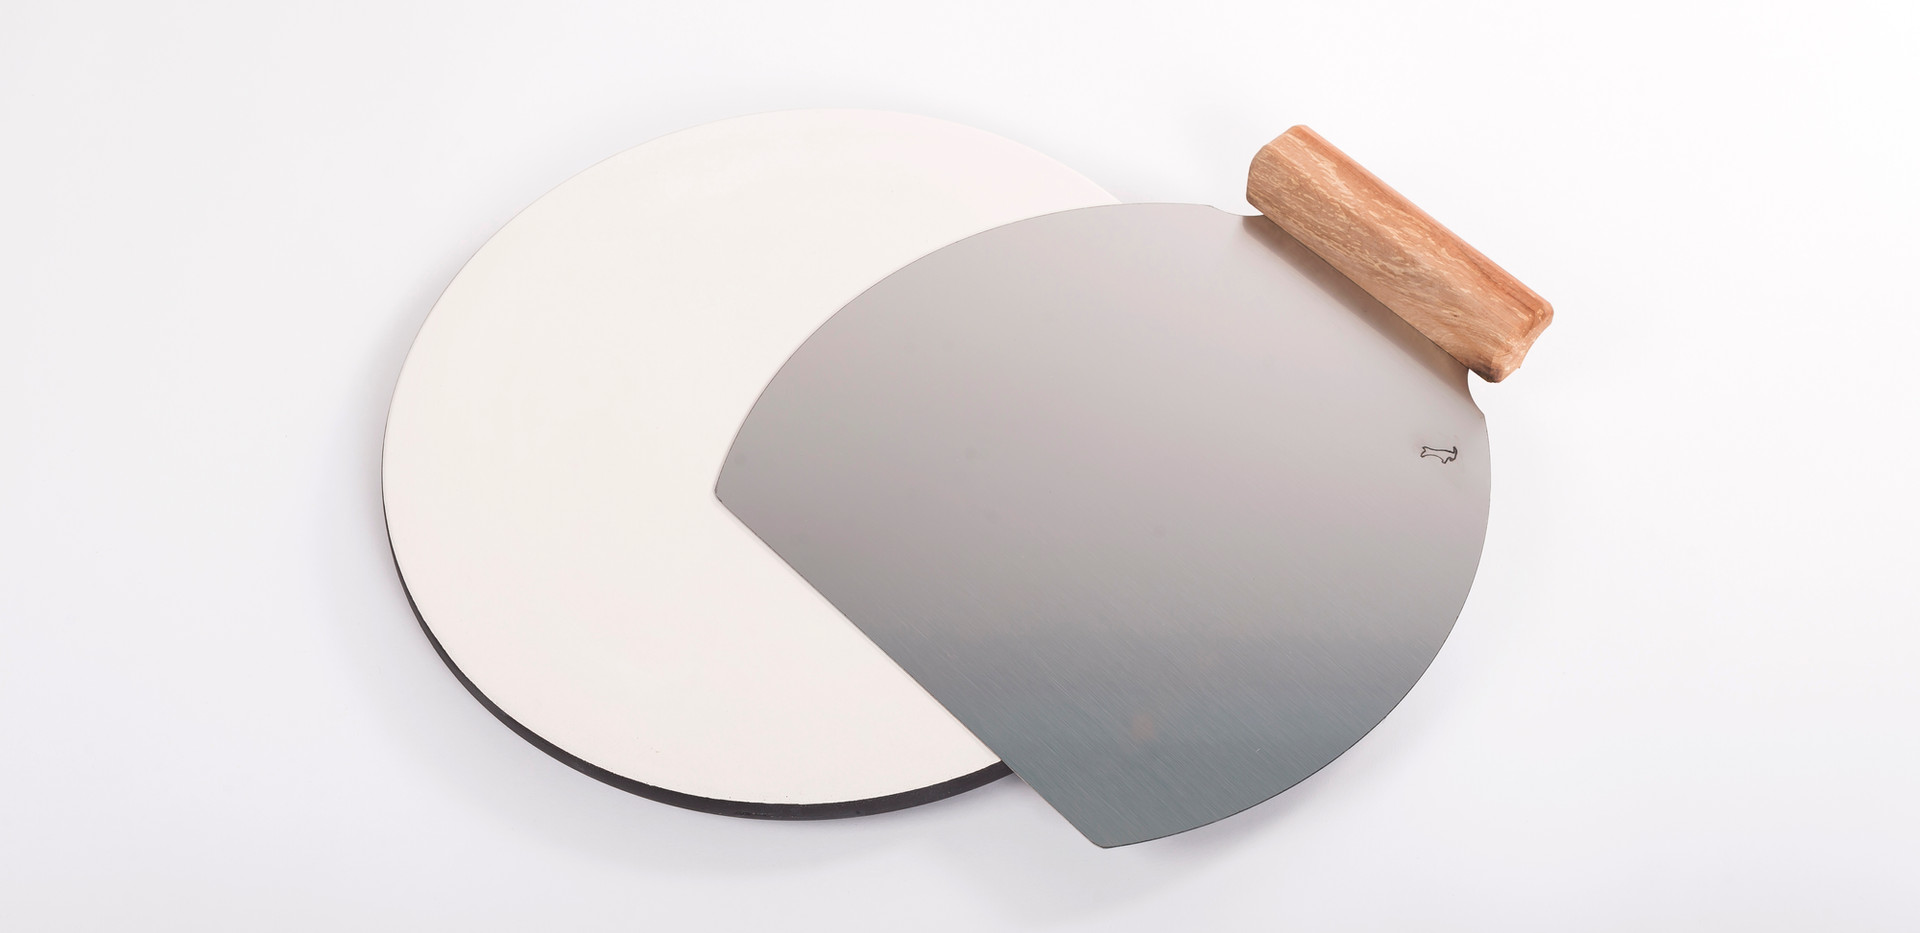 okrogla glinena plošča za peko + lopar